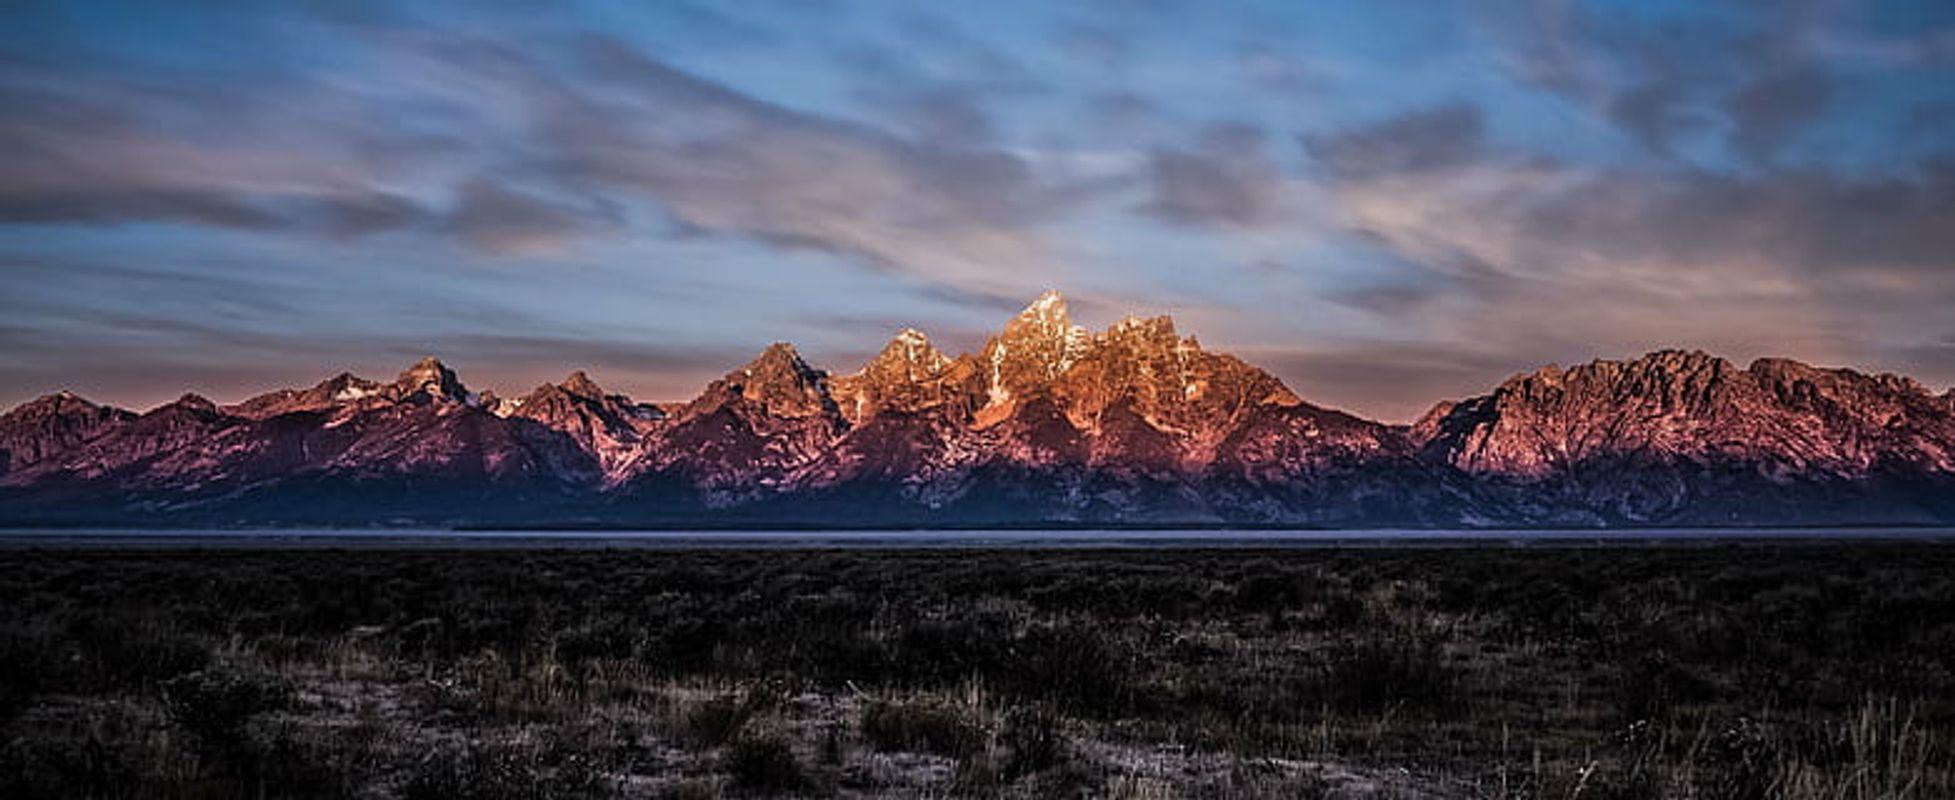 Mountain-range-landscape-nature-thumbnail